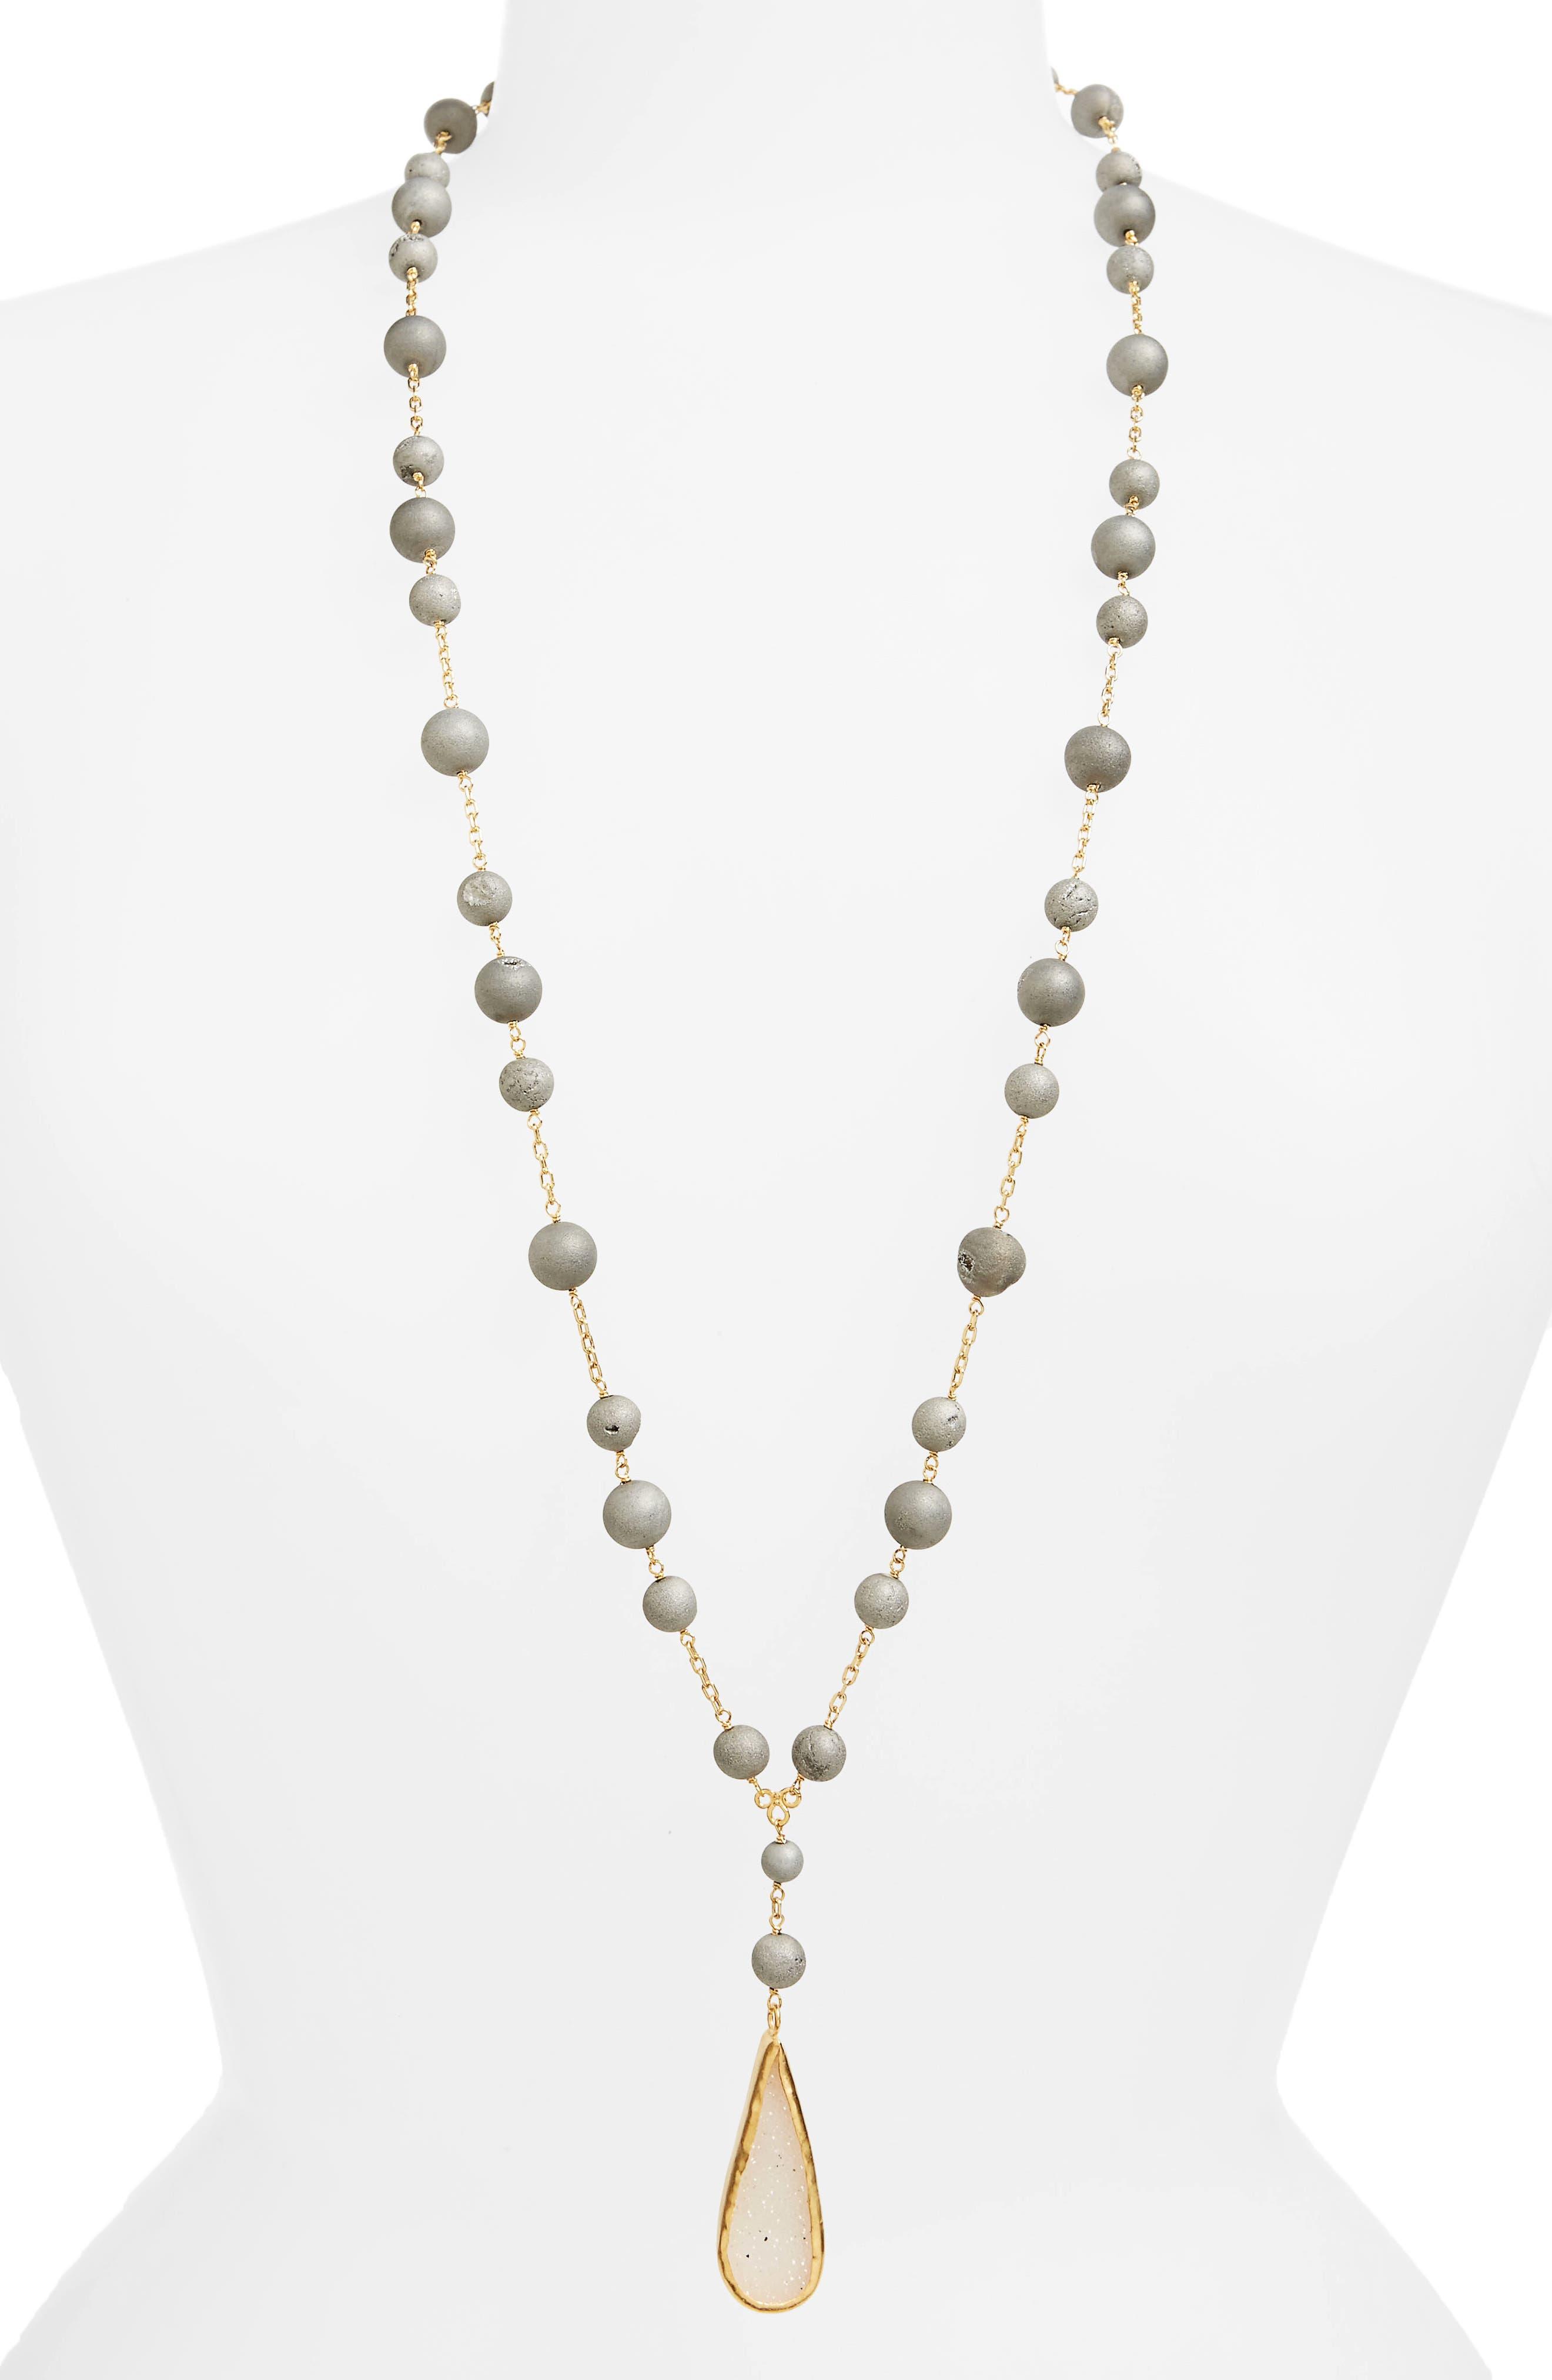 Drusy Agate Pendant Necklace,                         Main,                         color, Silver Agate